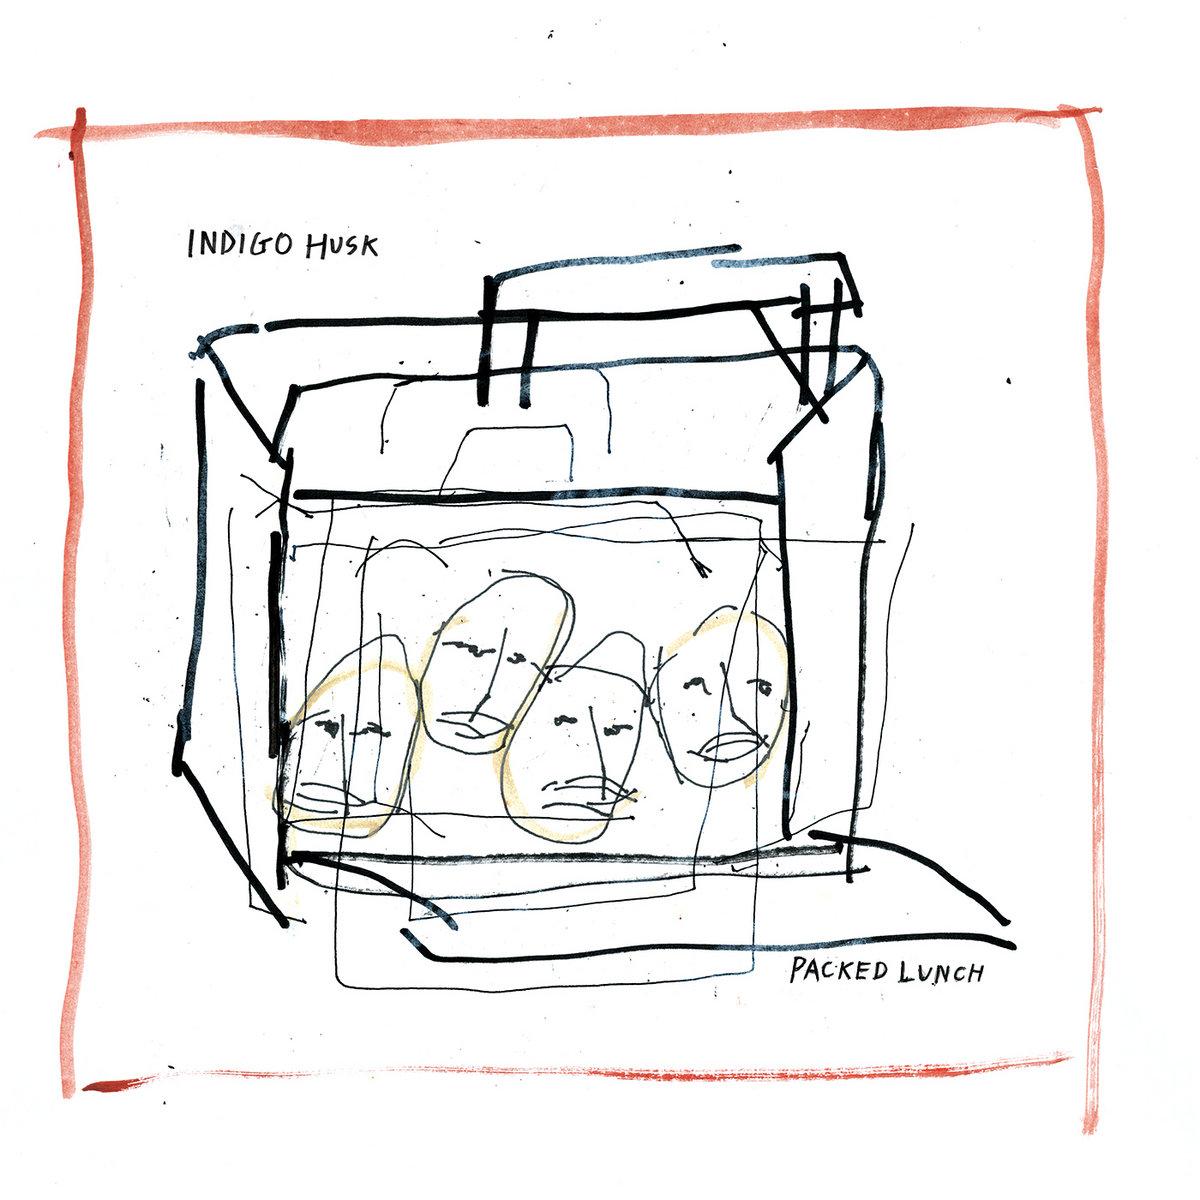 Misbehave | Indigo Husk